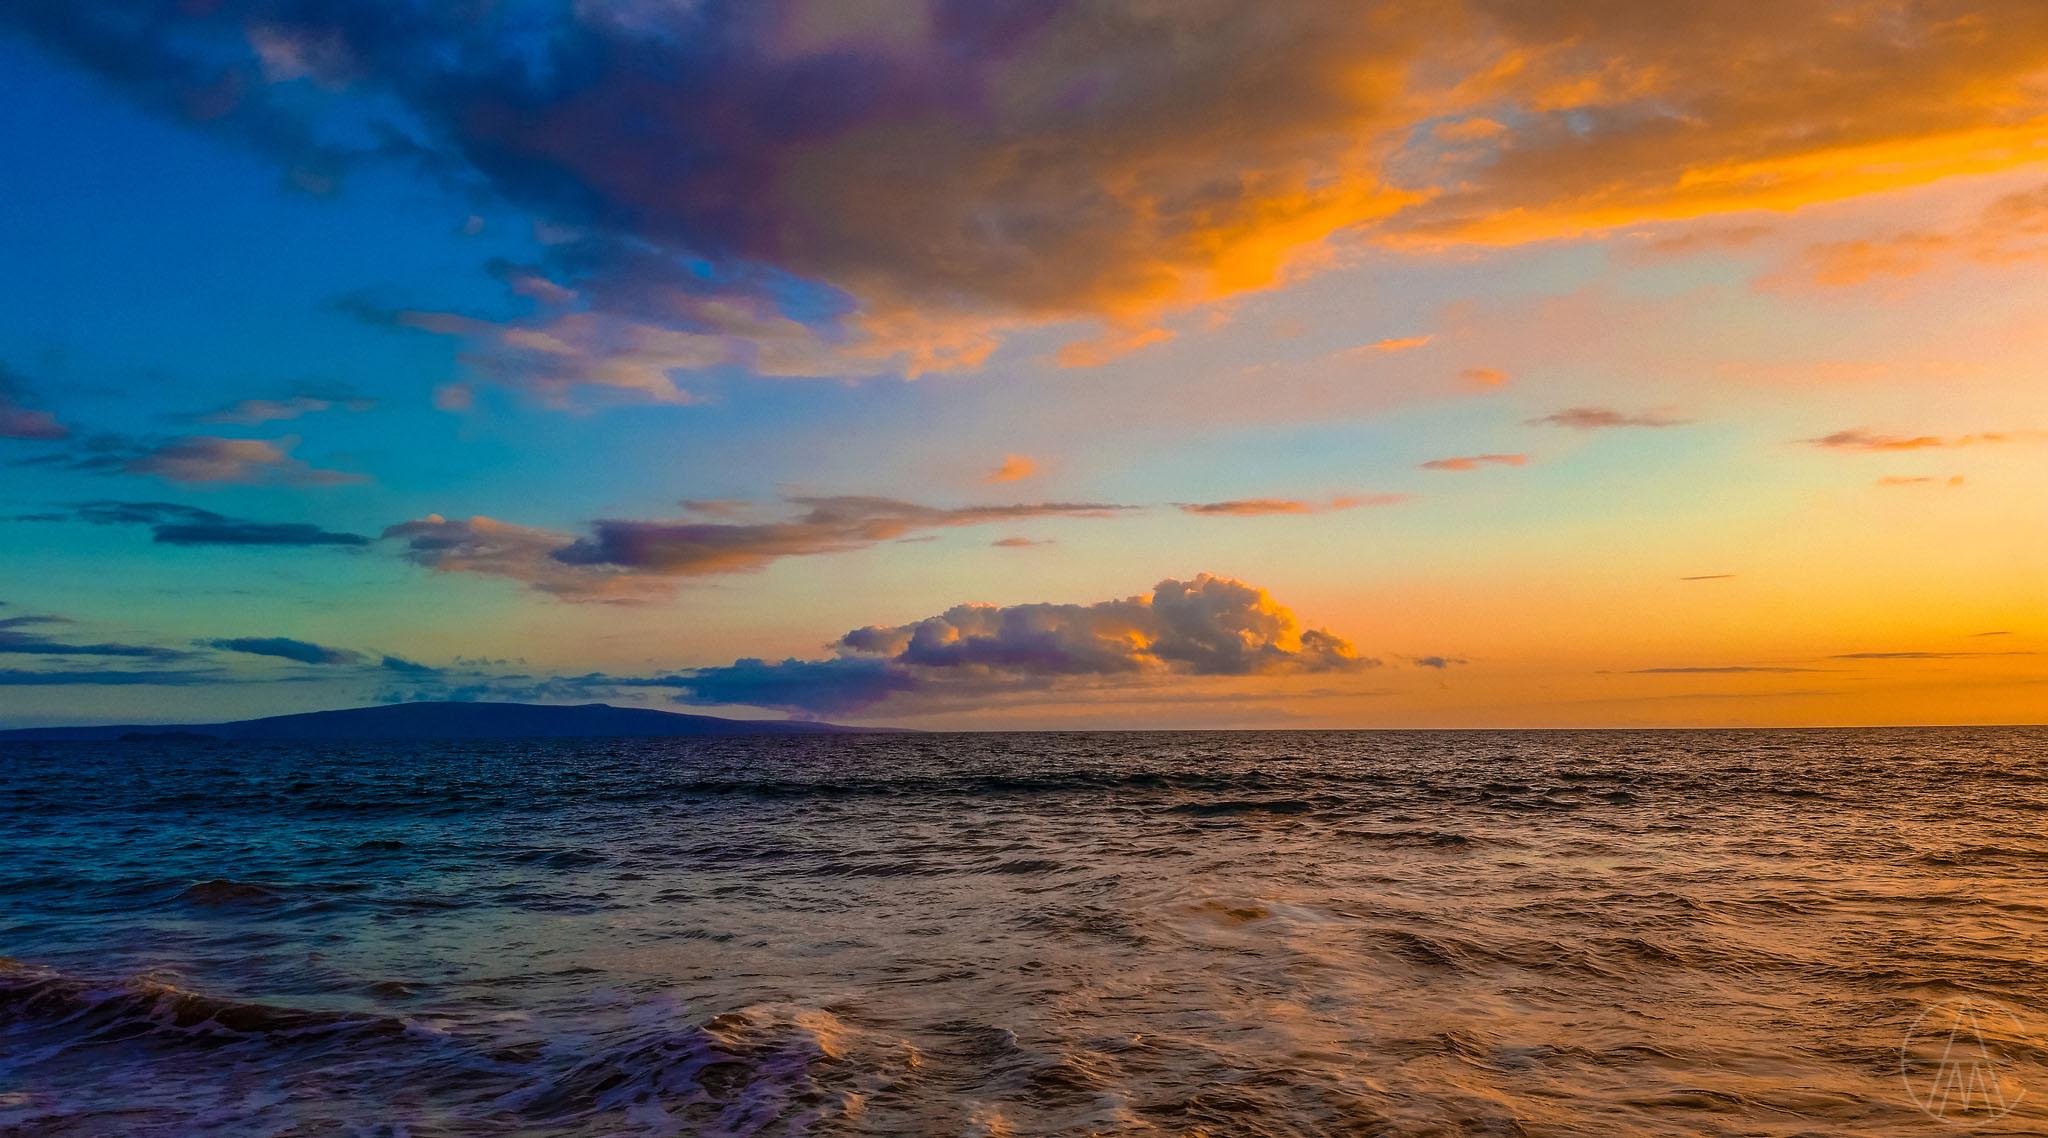 MauiHawaii_CoastColorfulSunsetBeach_FACEBOOK.jpg